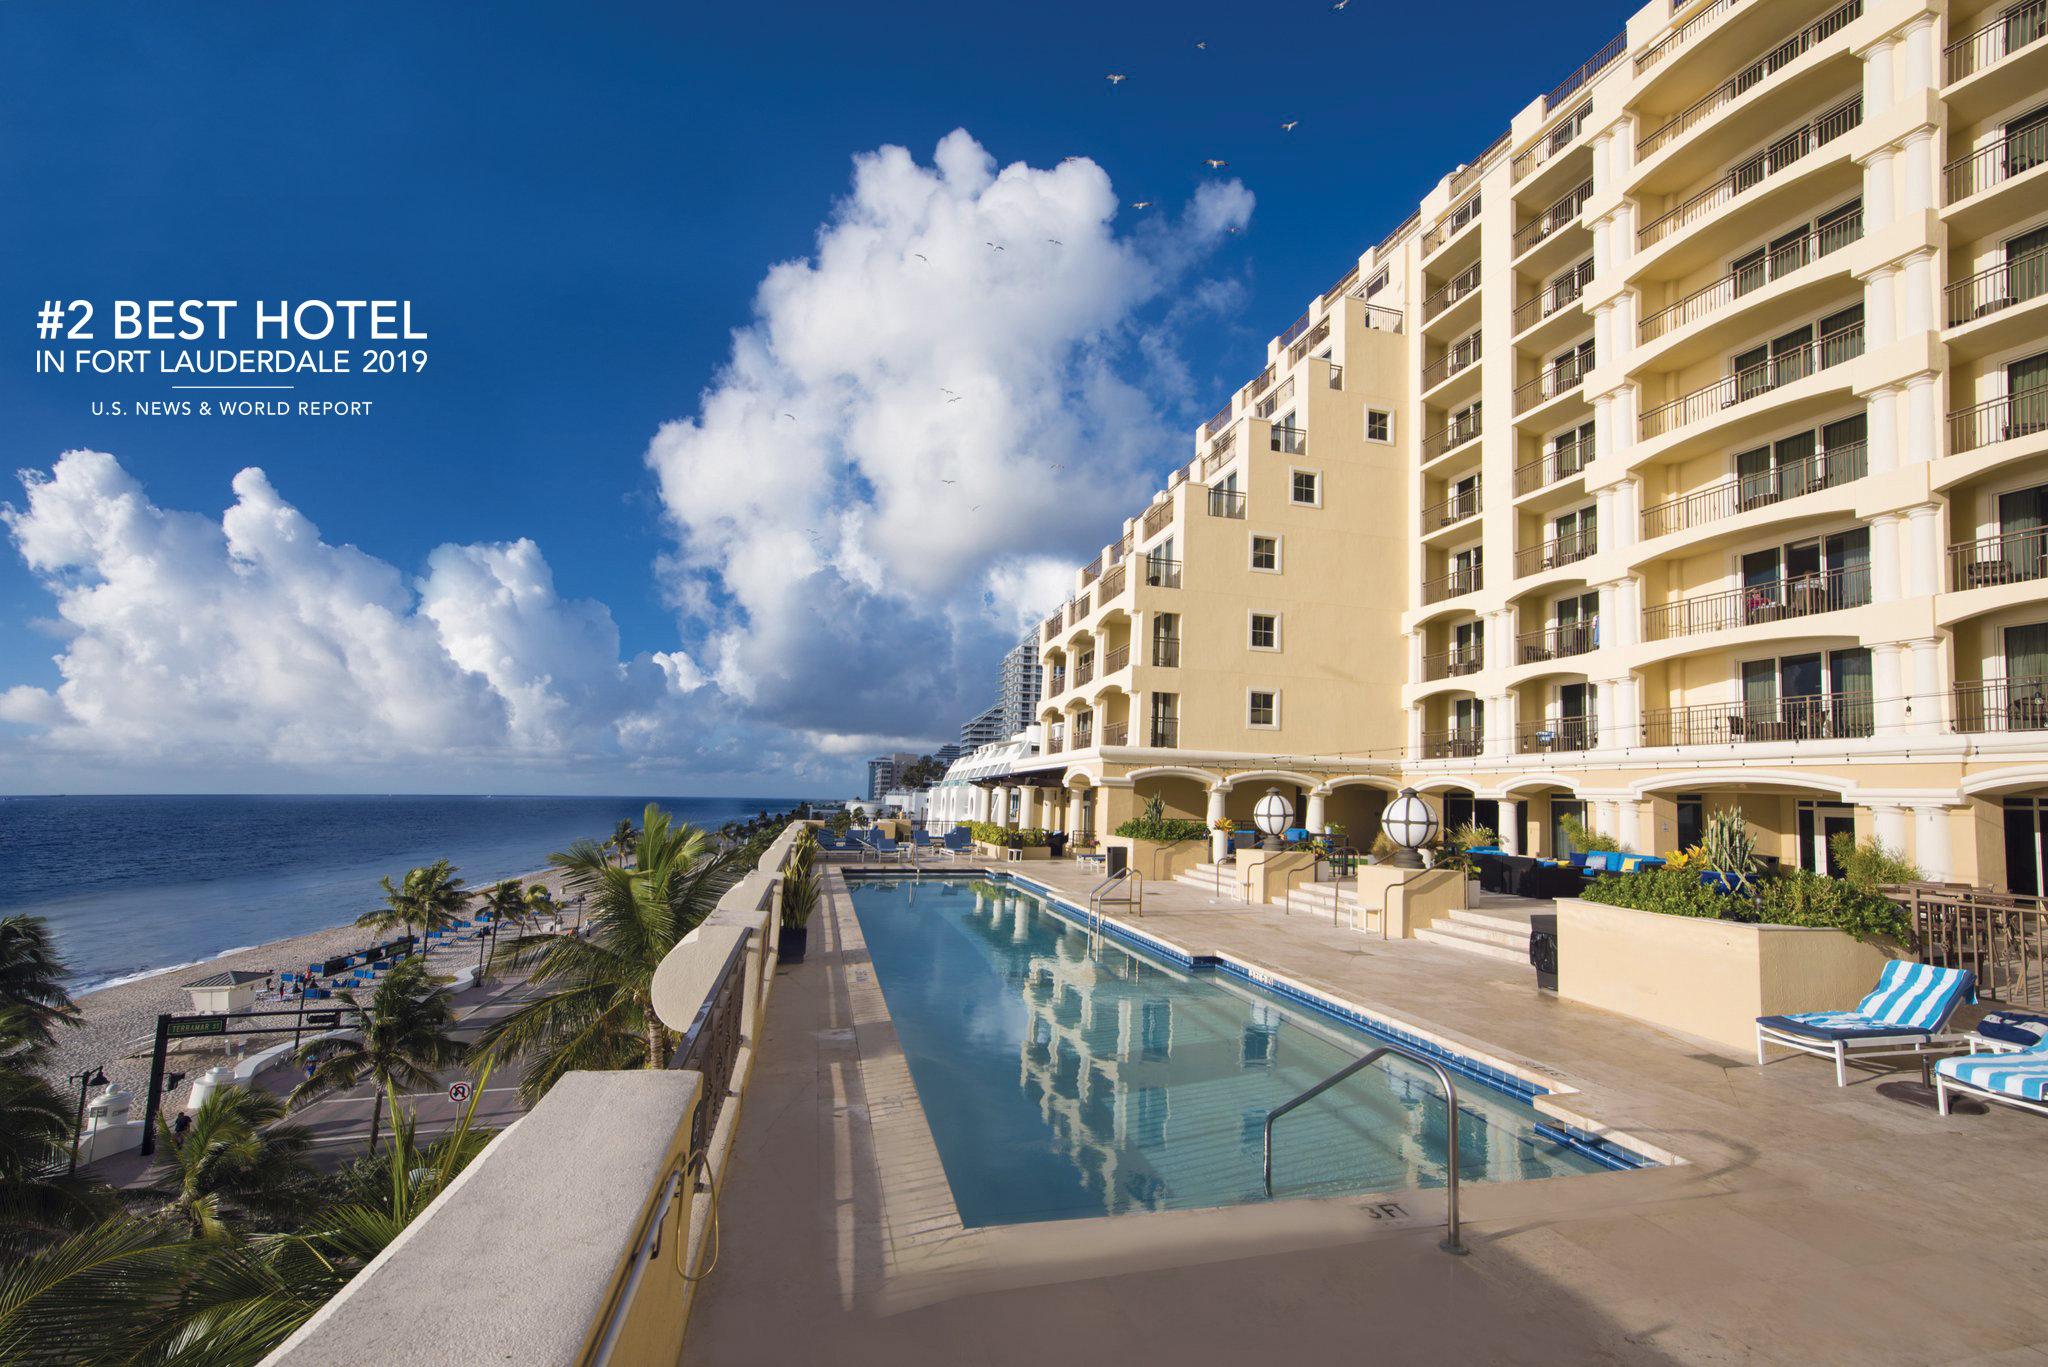 Luxury Hotel In Fort Lauderdale The Atlantic Hotel Spa